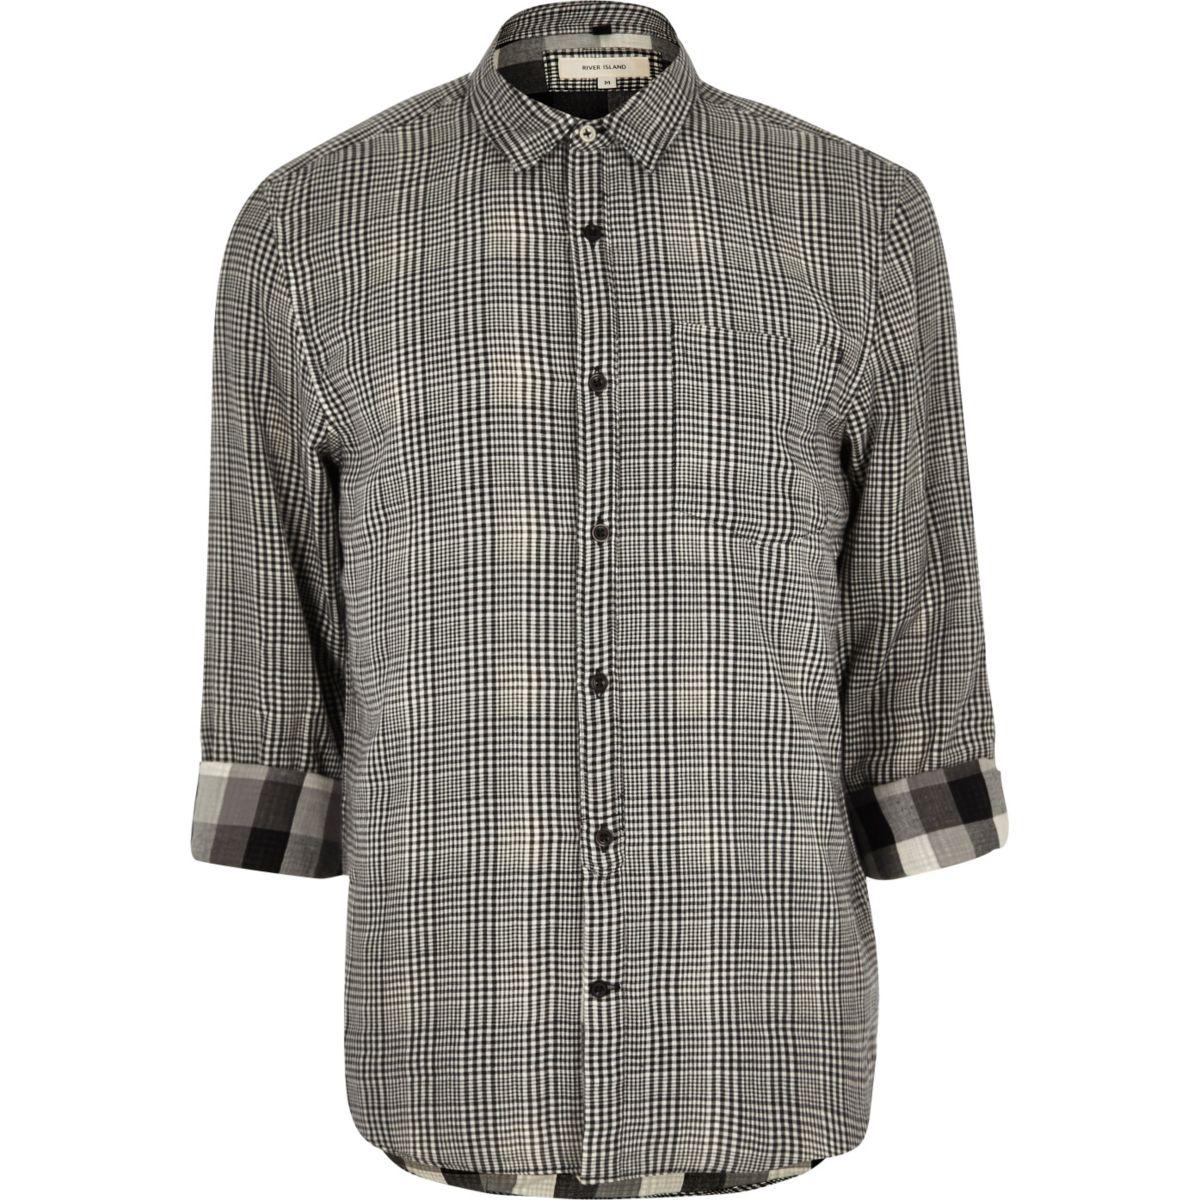 Black textured check shirt